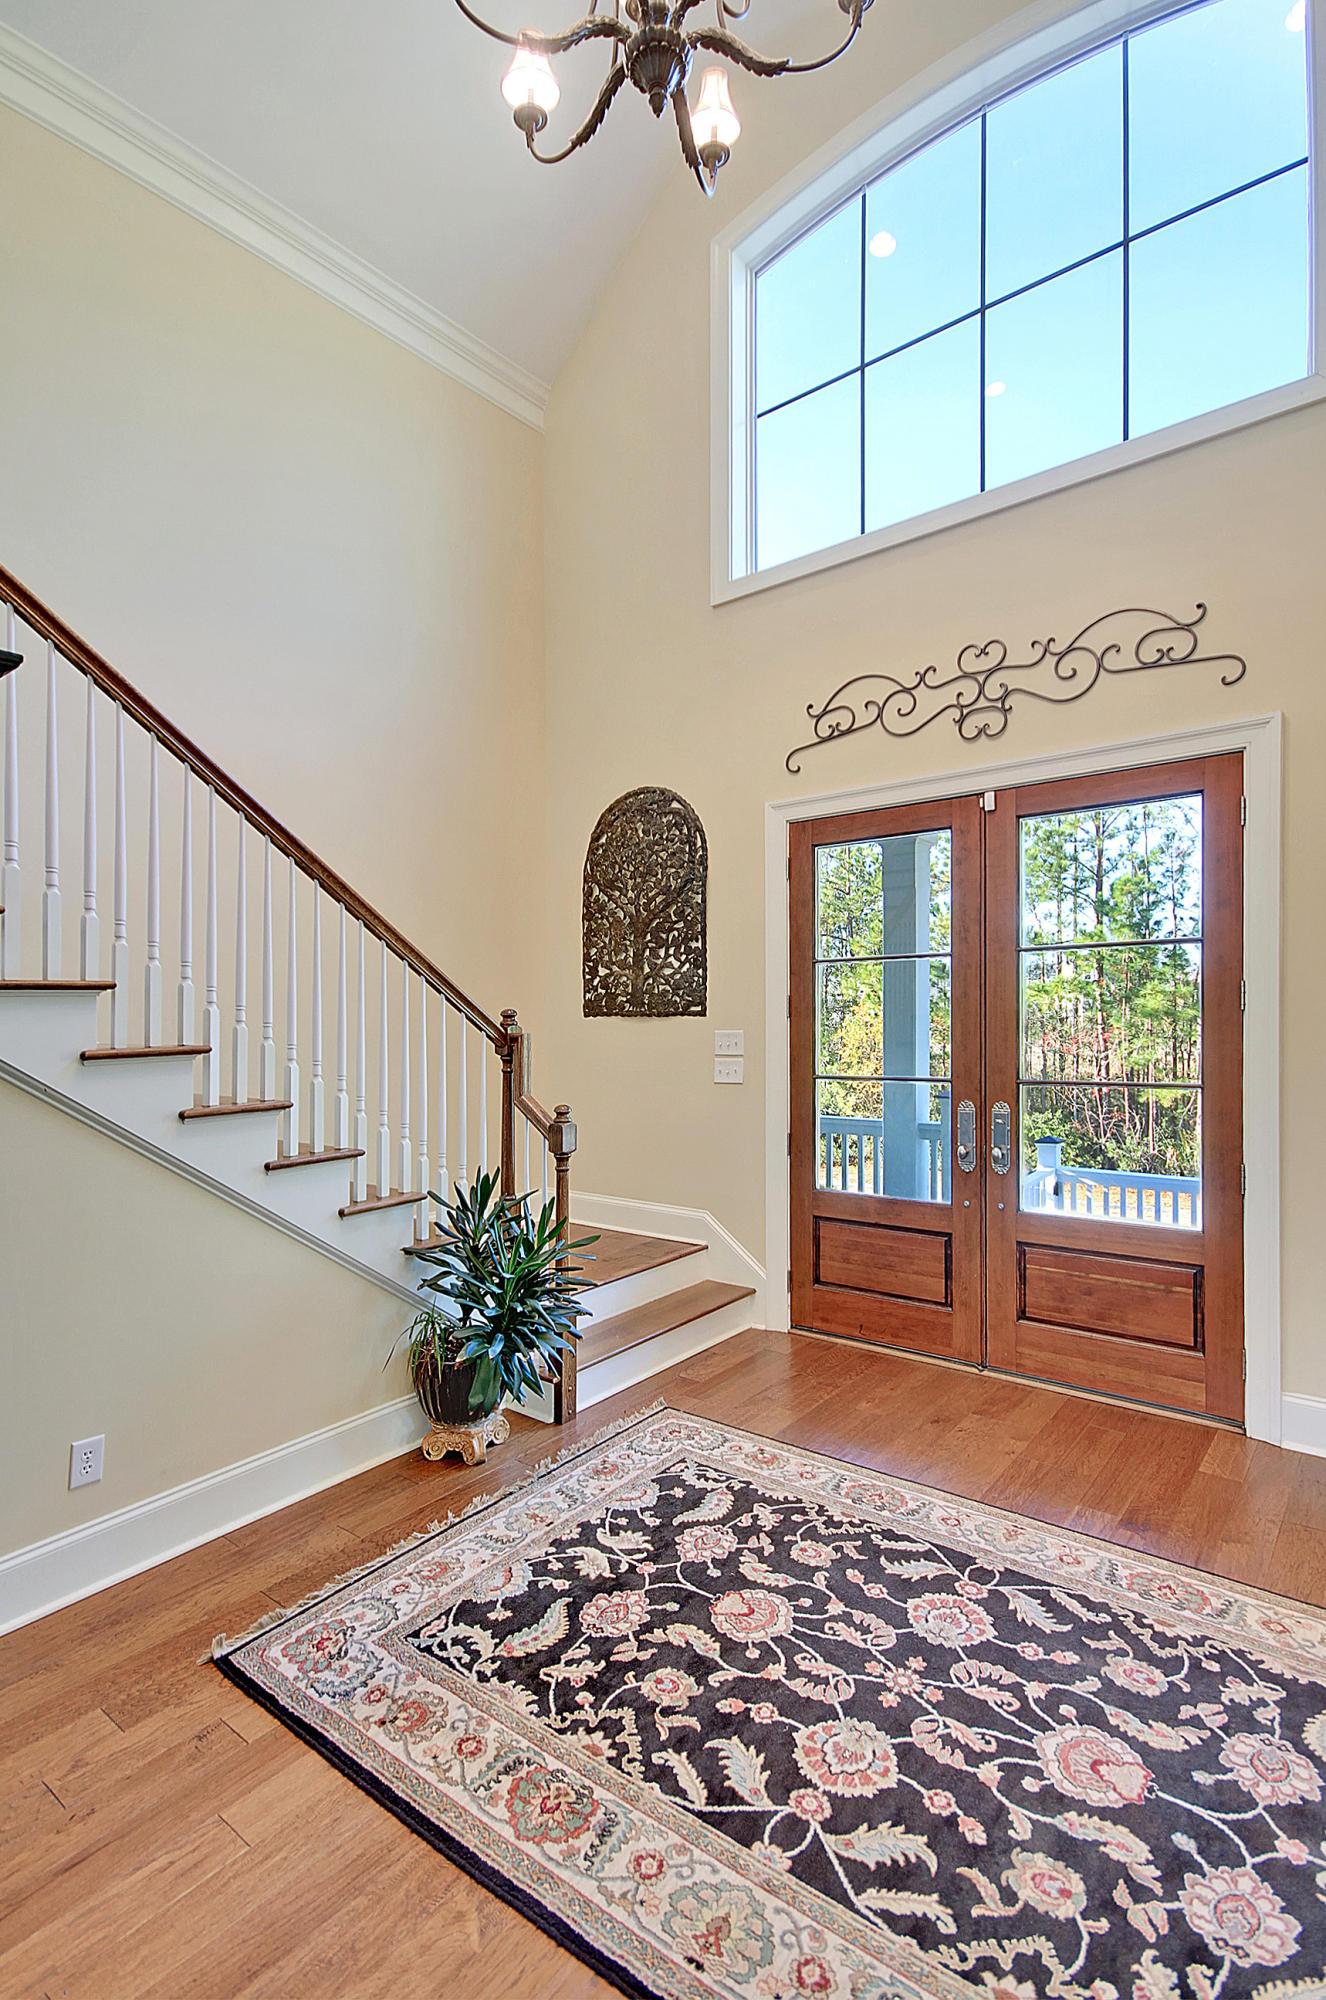 Rivertowne Country Club Homes For Sale - 2601 Kiln Creek, Mount Pleasant, SC - 22